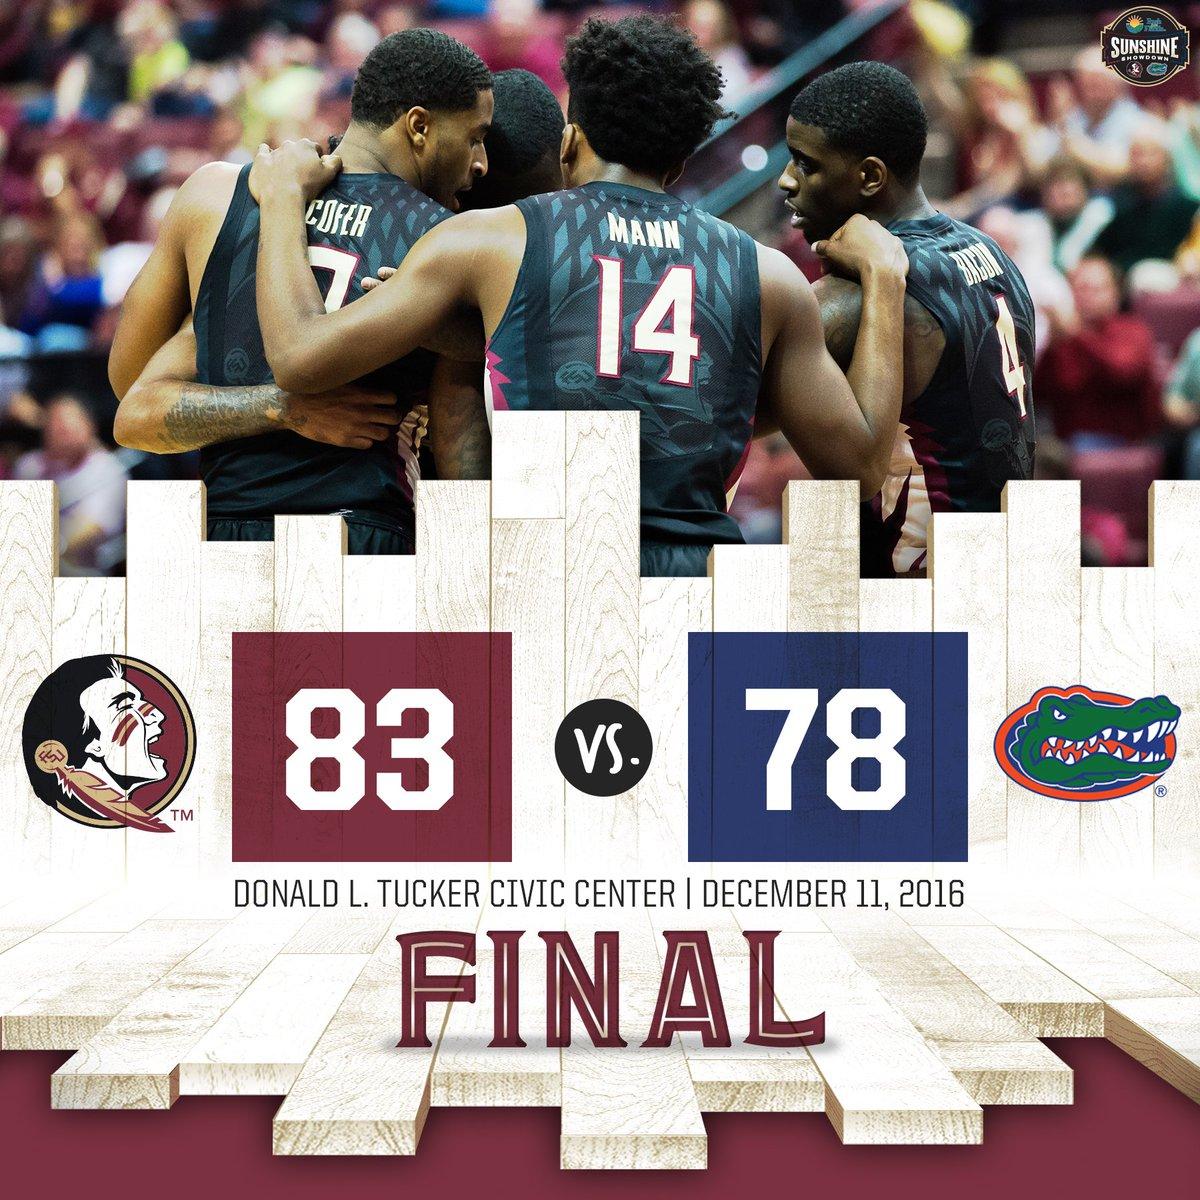 FINAL! #Noles beat the Gators! https://t.co/zoCzW8ZJi4